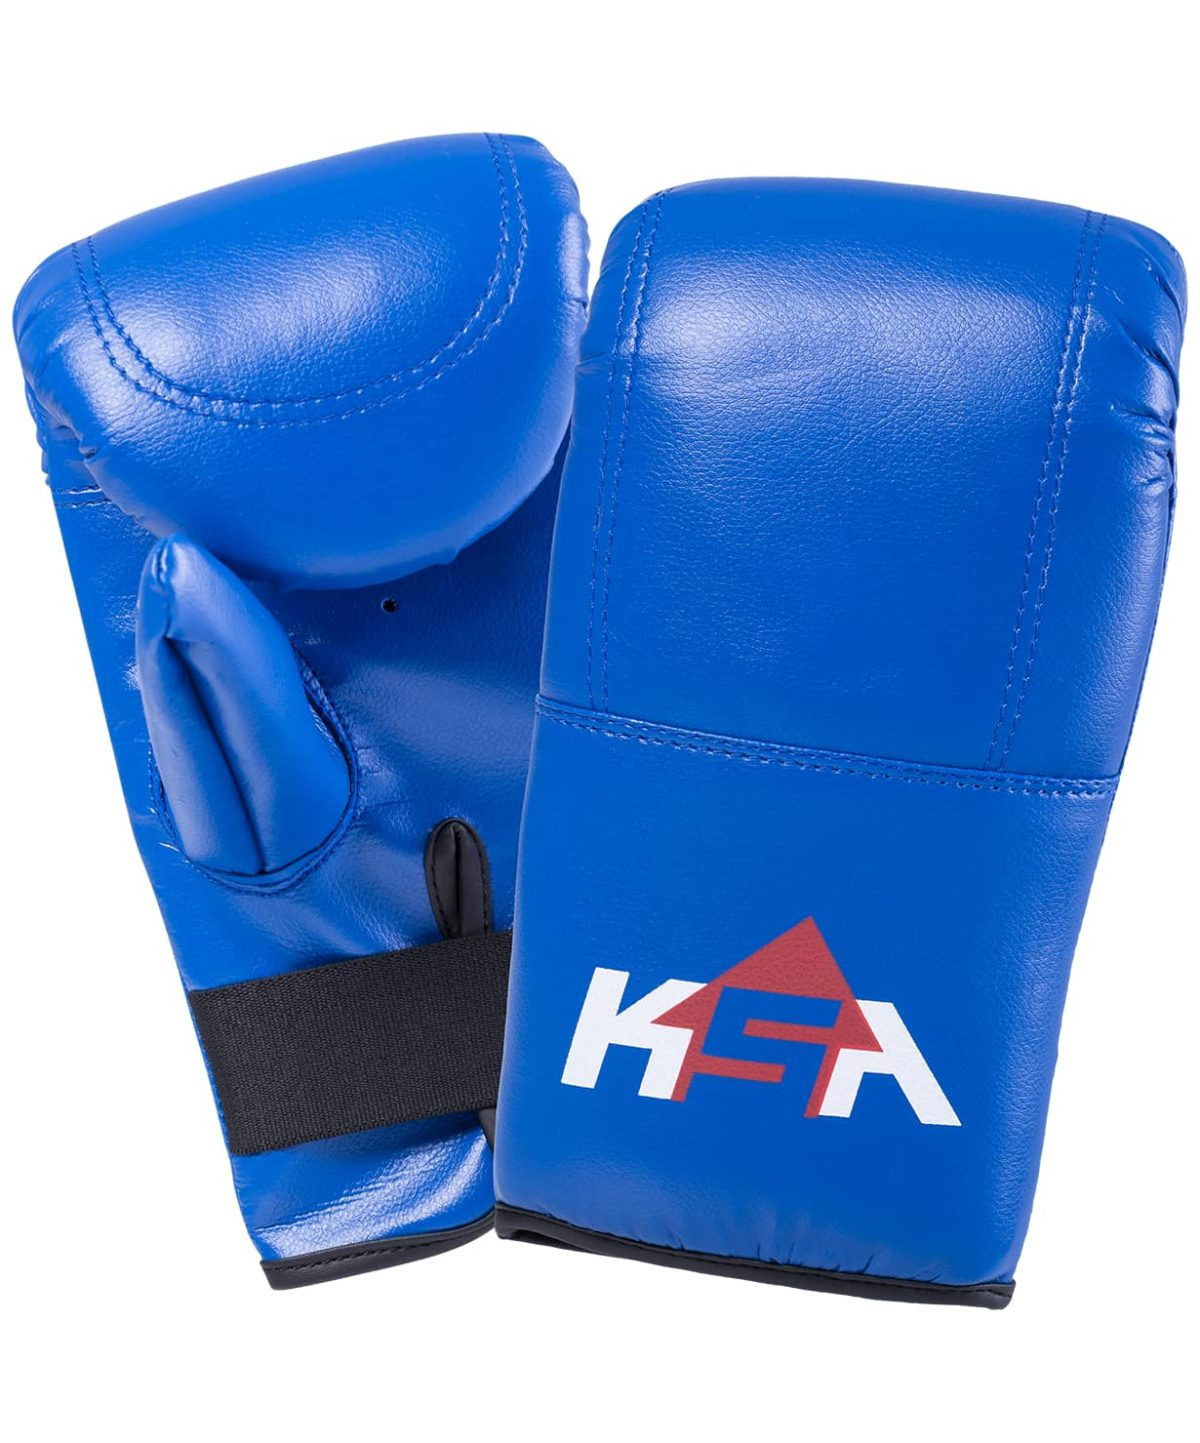 KSA Перчатки снарядные Bull, к/з 1784: синий - 1